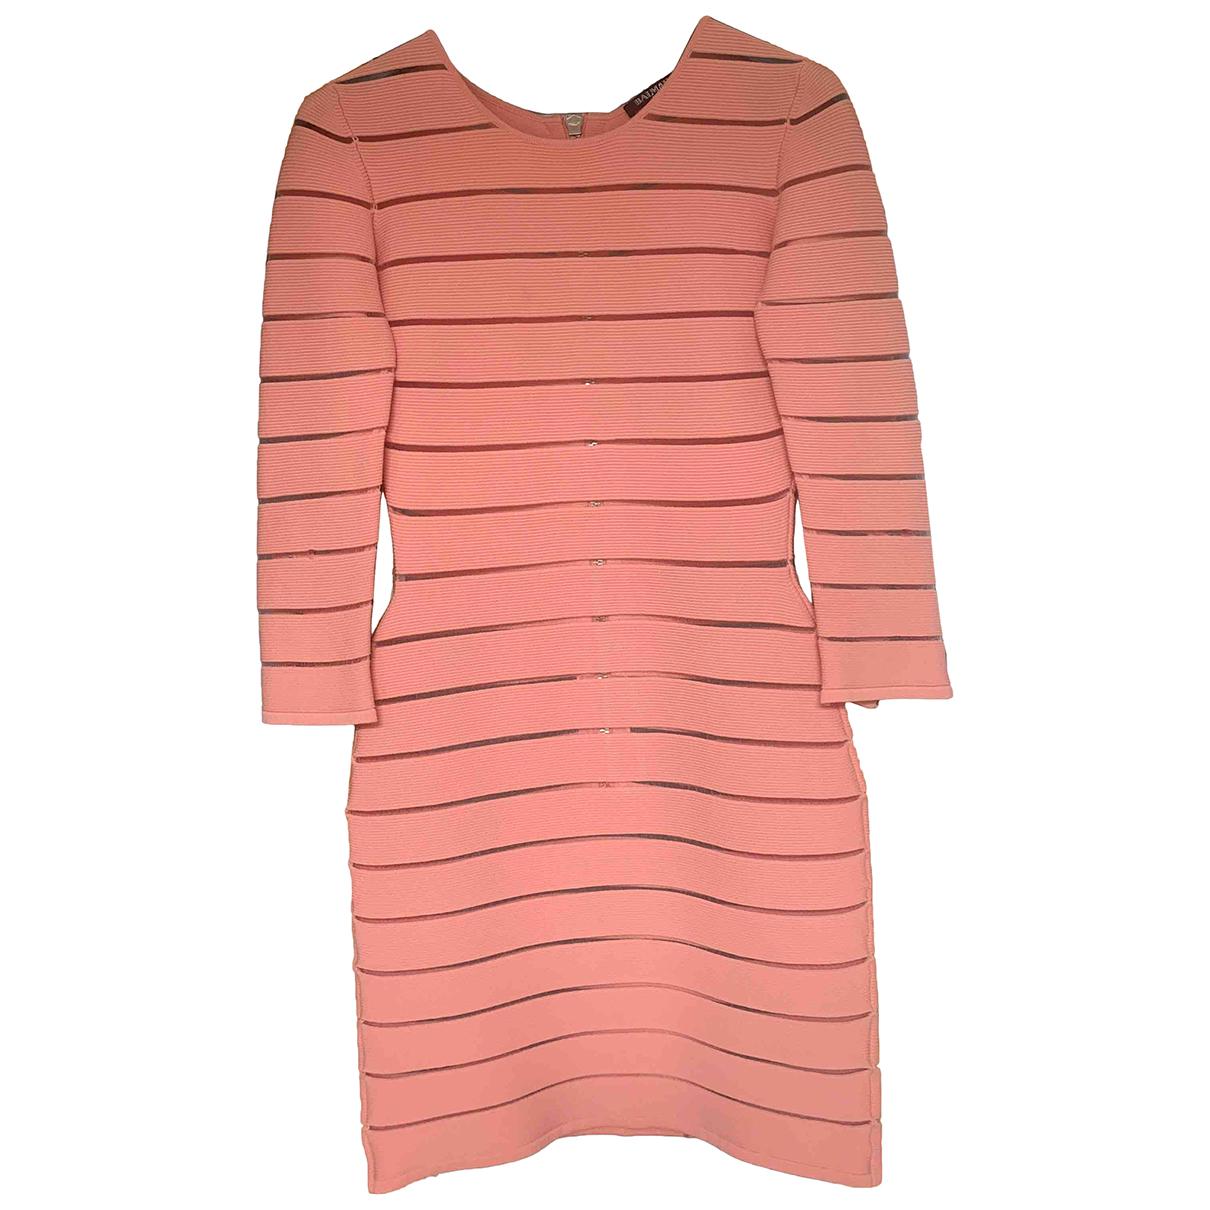 Balmain \N Pink dress for Women 36 FR